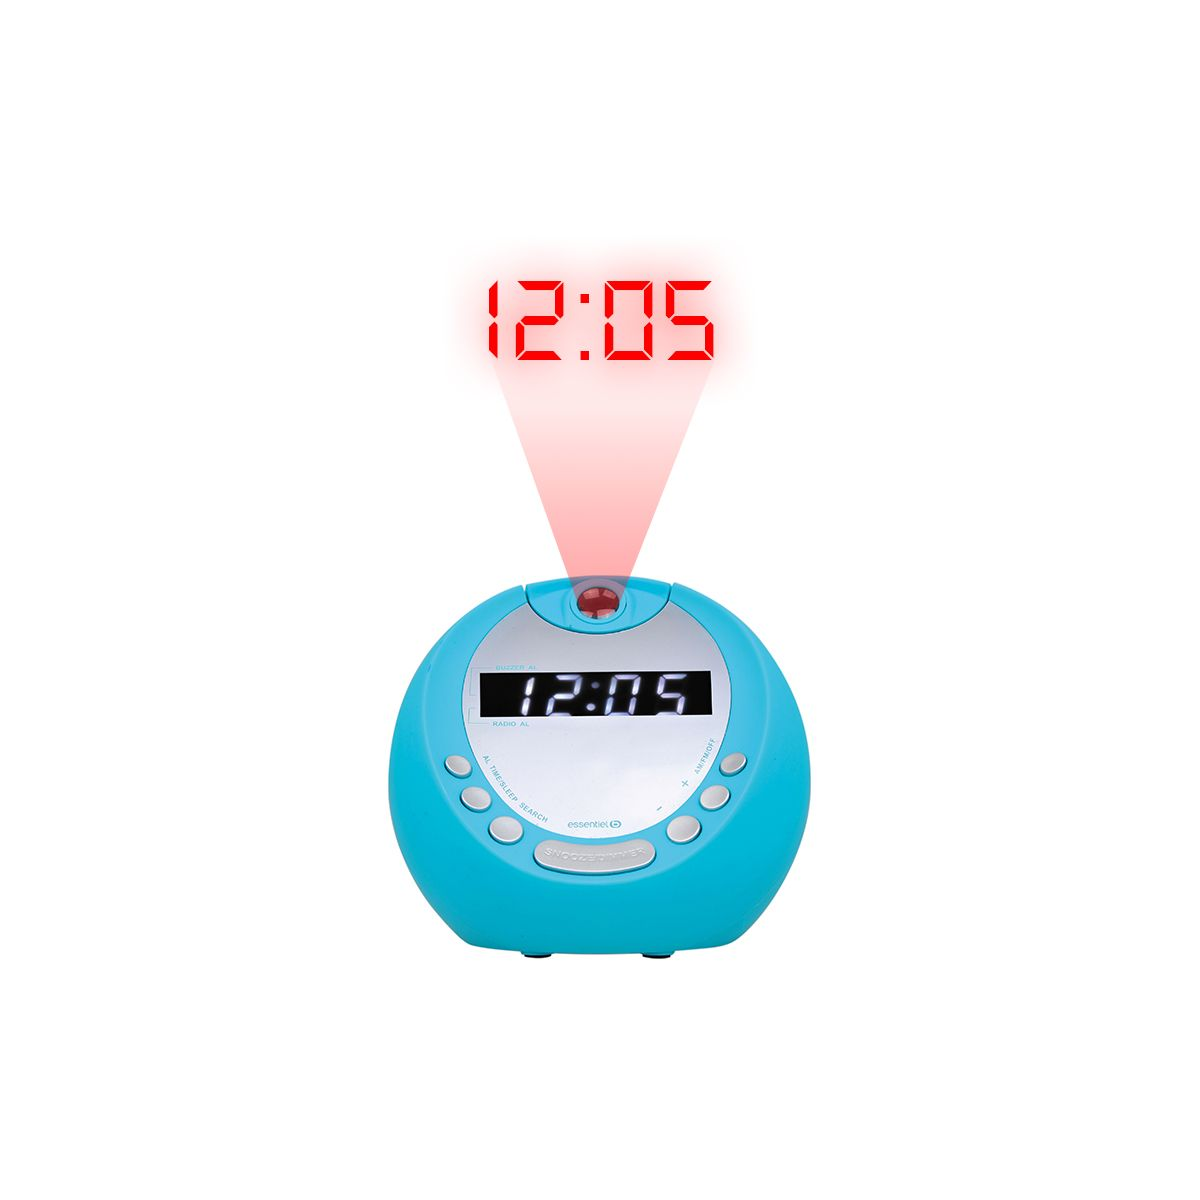 Radio réveil ESSENTIELB Get Up Turquoise (photo)